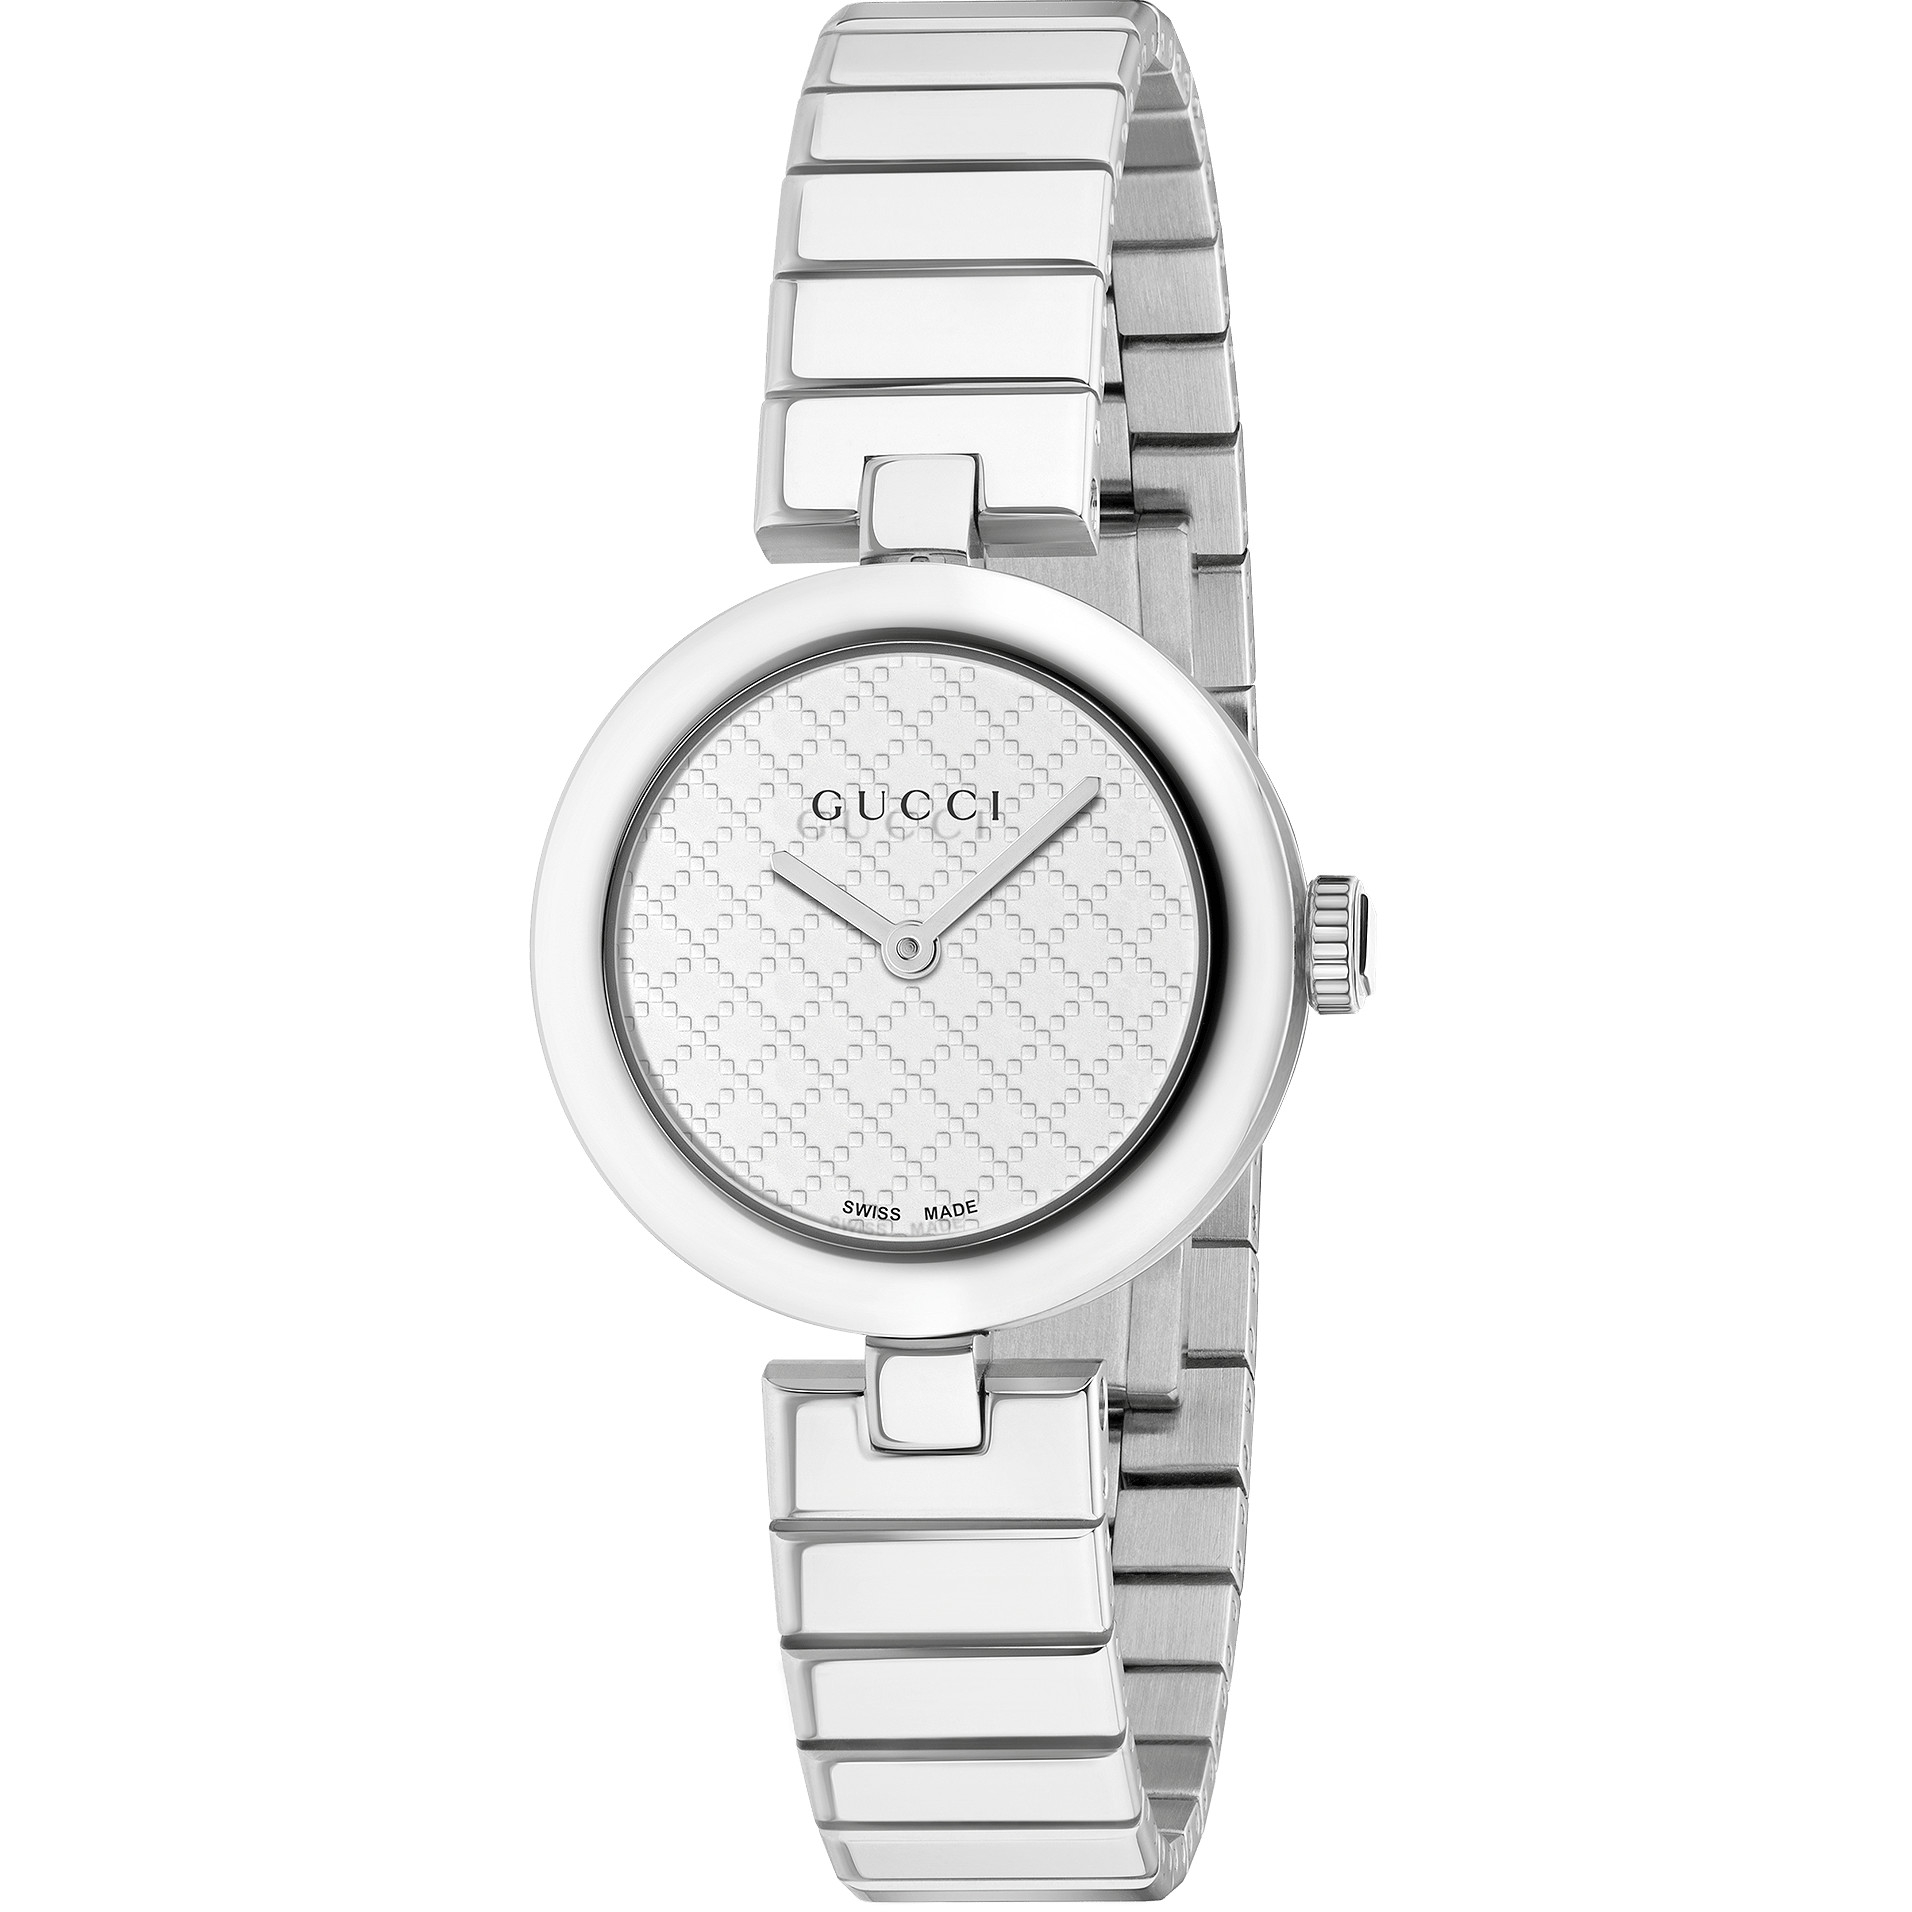 Ladies Gucci Diamantissima Small Watch (YA141502)   WatchShop.com™ 54e8edb5d90